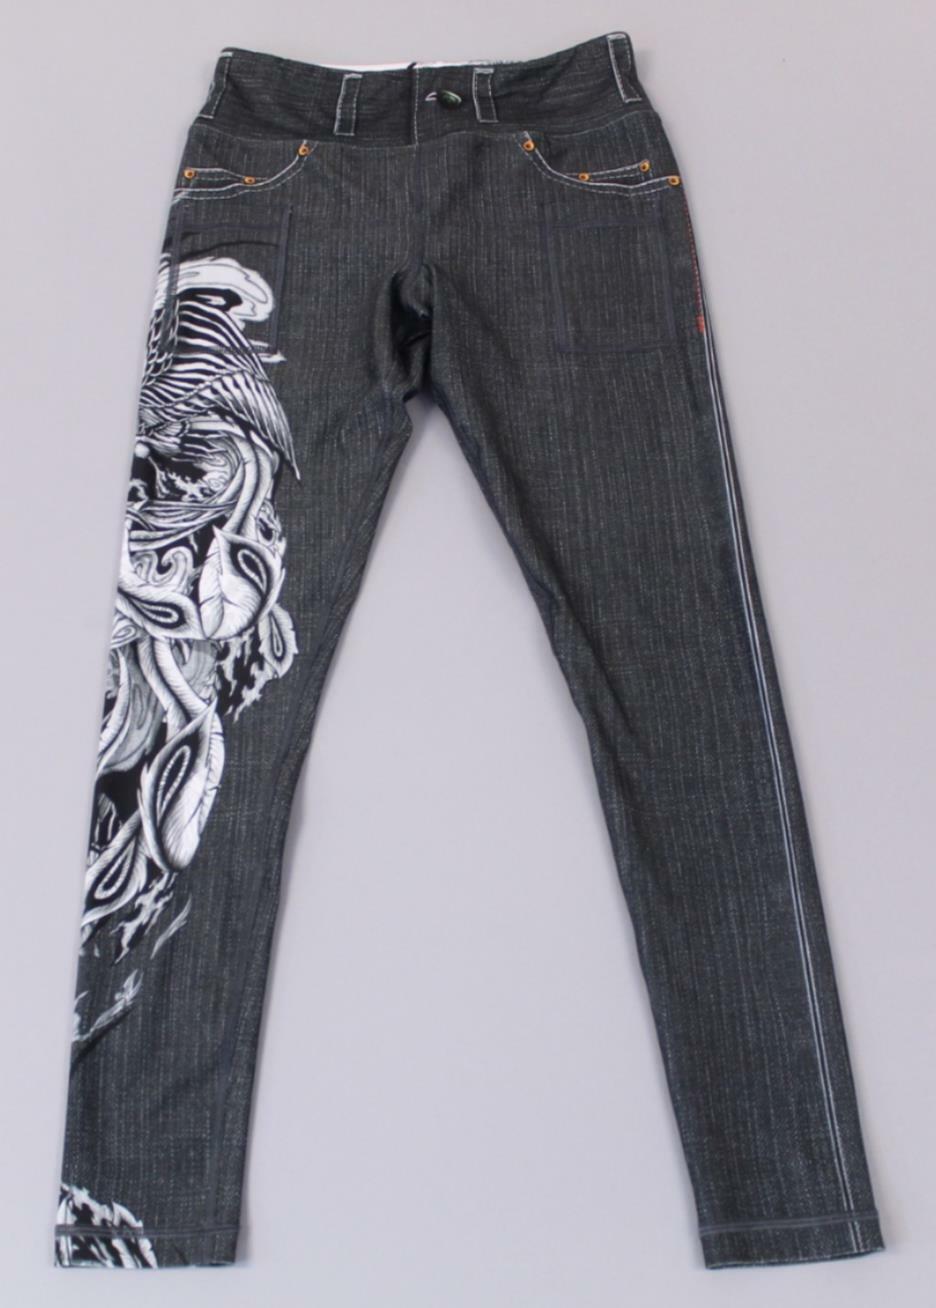 INKnBurn  Mujer Phoenix Calzas GG8 Multi-Color Tamaño 30x31  94.95  edición limitada en caliente